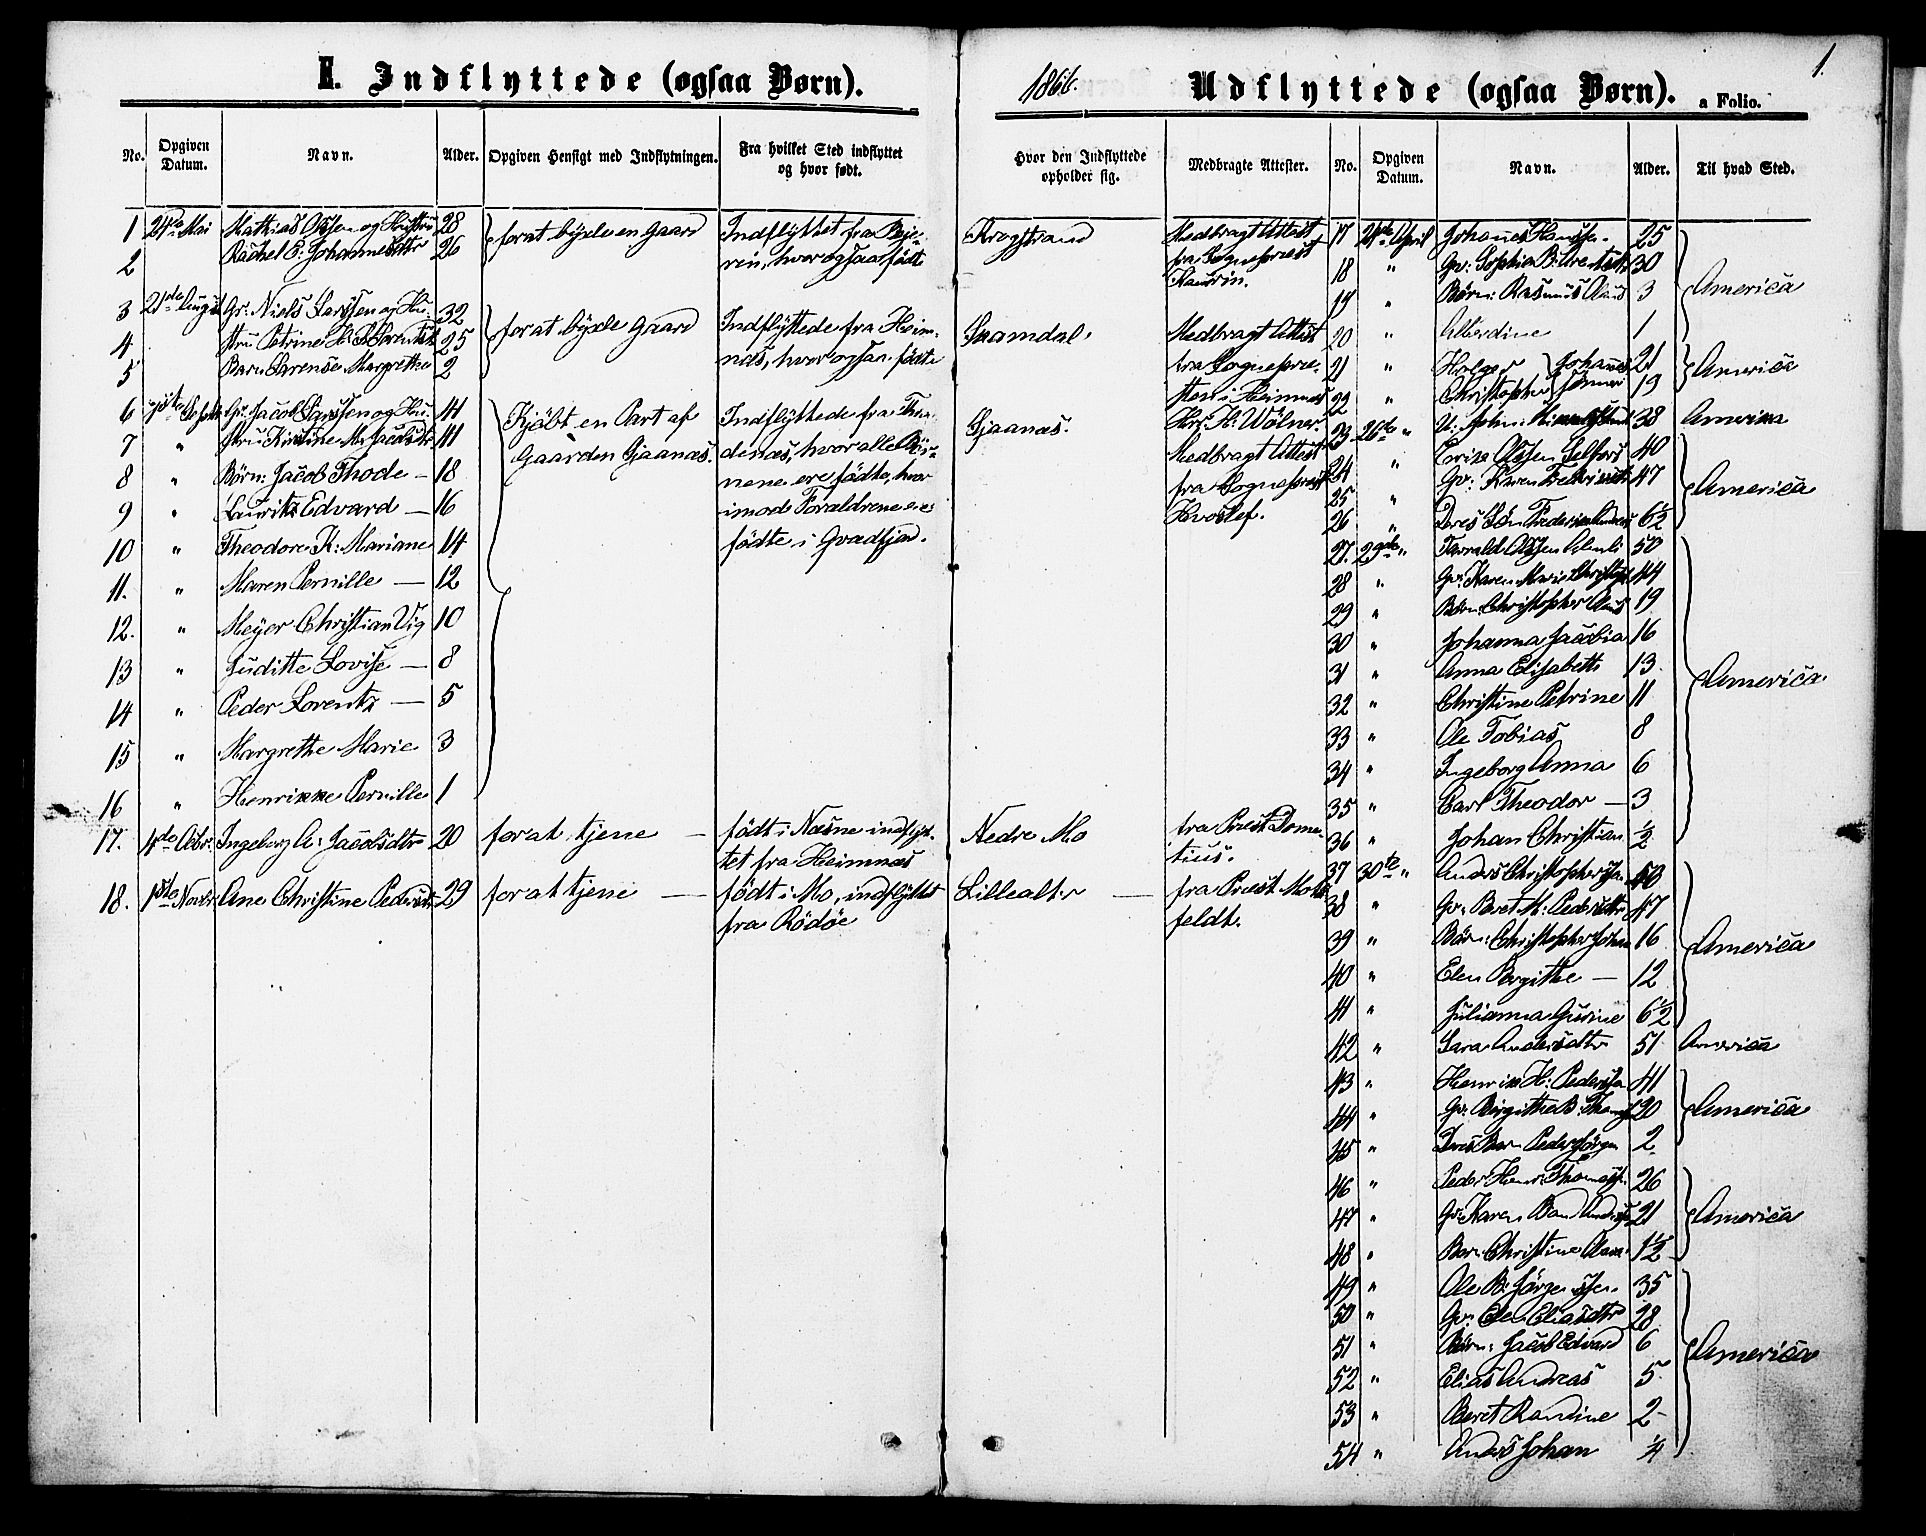 SAT, Ministerialprotokoller, klokkerbøker og fødselsregistre - Nordland, 827/L0398: Ministerialbok nr. 827A10, 1866-1886, s. 1